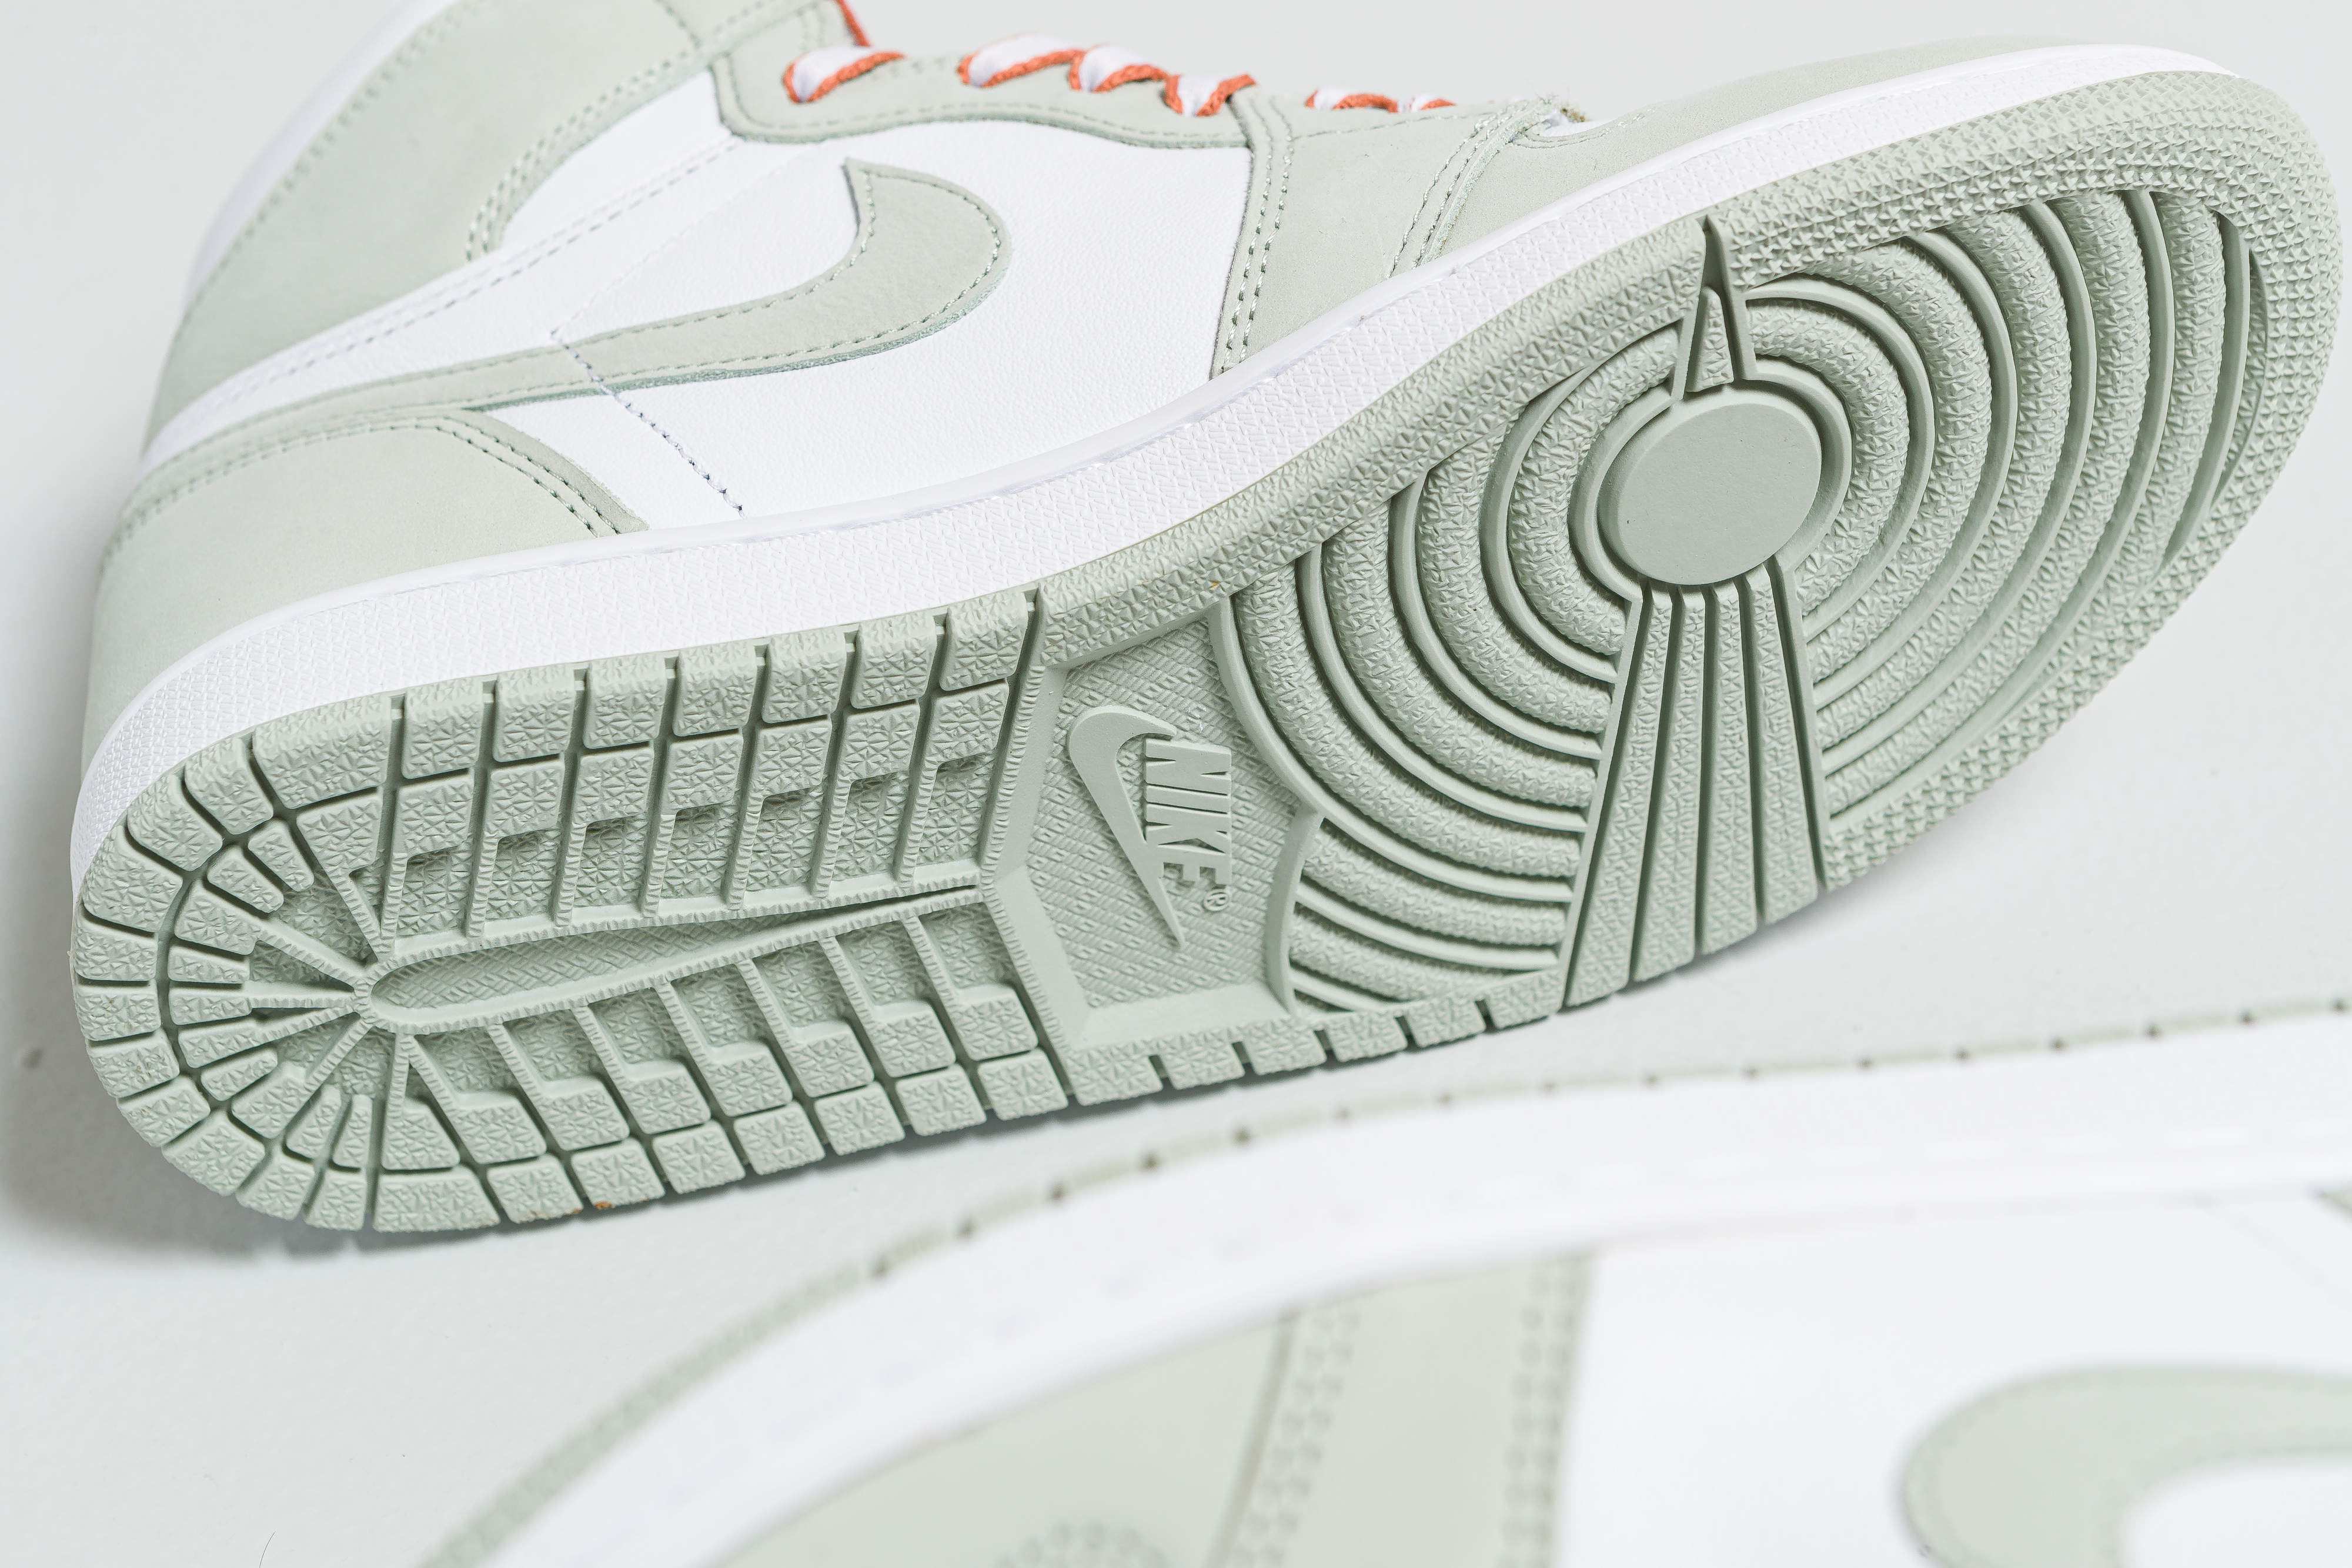 Up There Launches - Nike Women's Air Jordan 1 High OG 'Sea Foam'